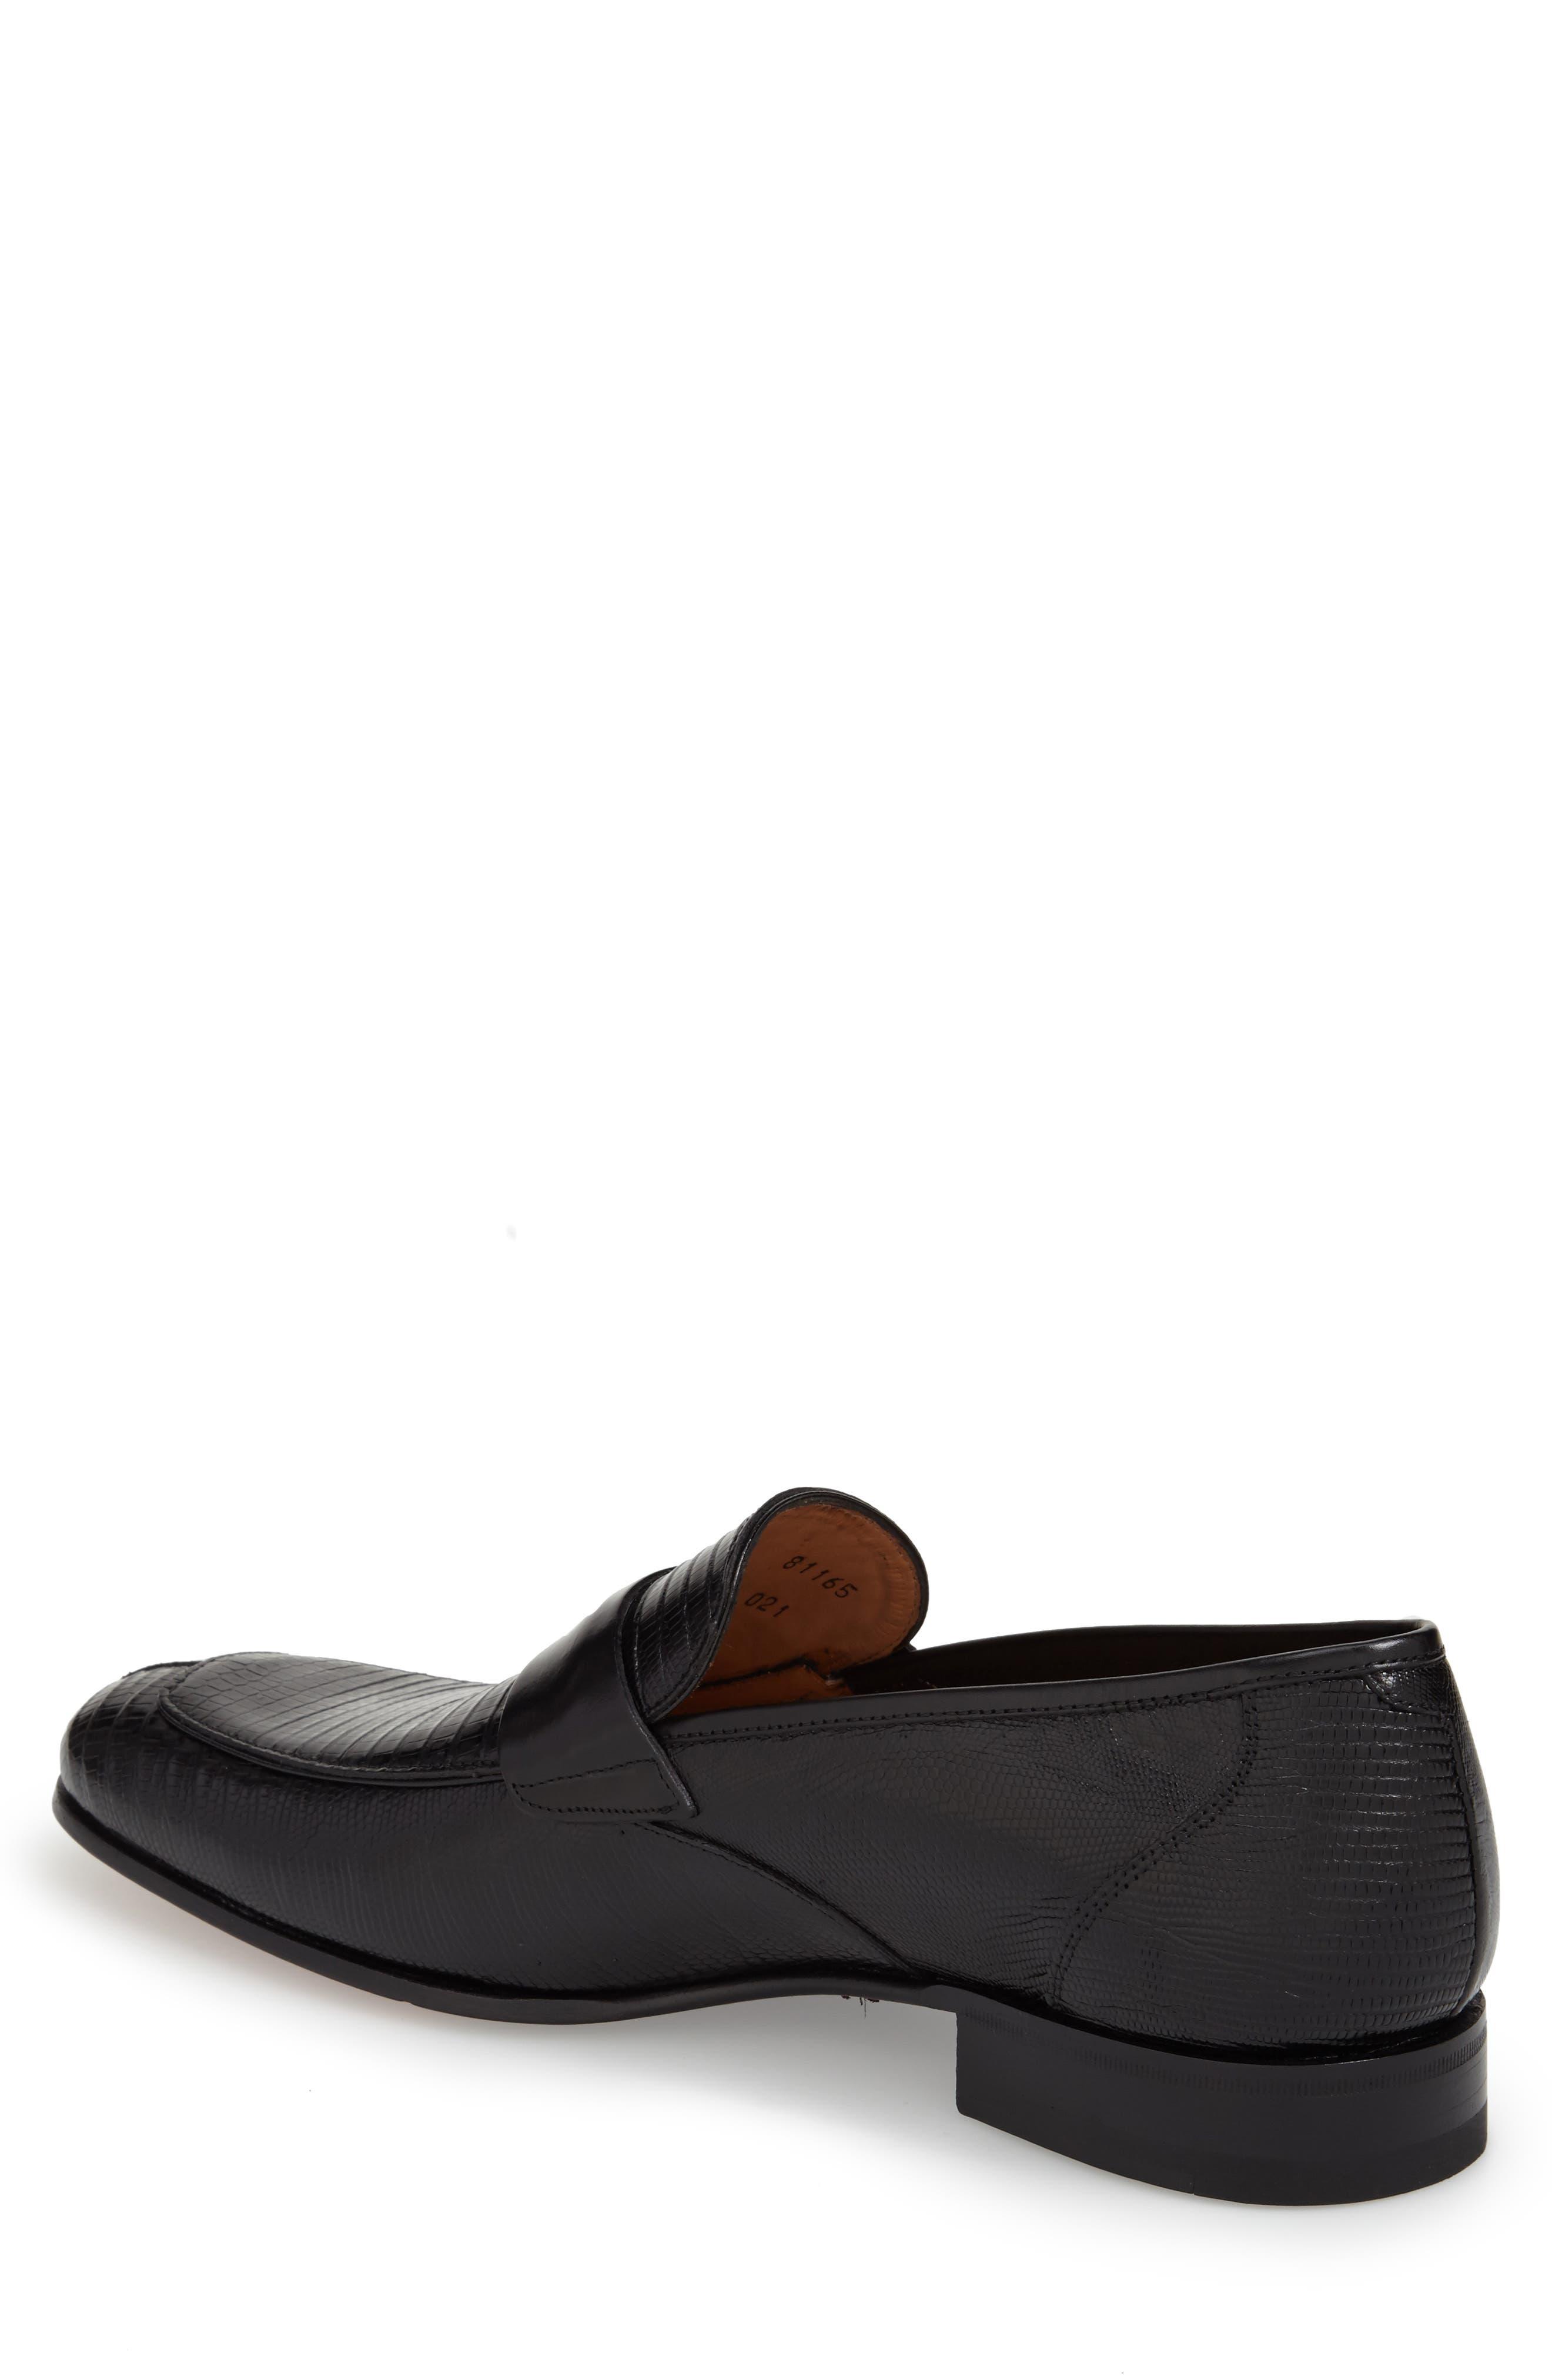 'Lipari' Lizard Leather Penny Loafer,                             Alternate thumbnail 6, color,                             BLACK